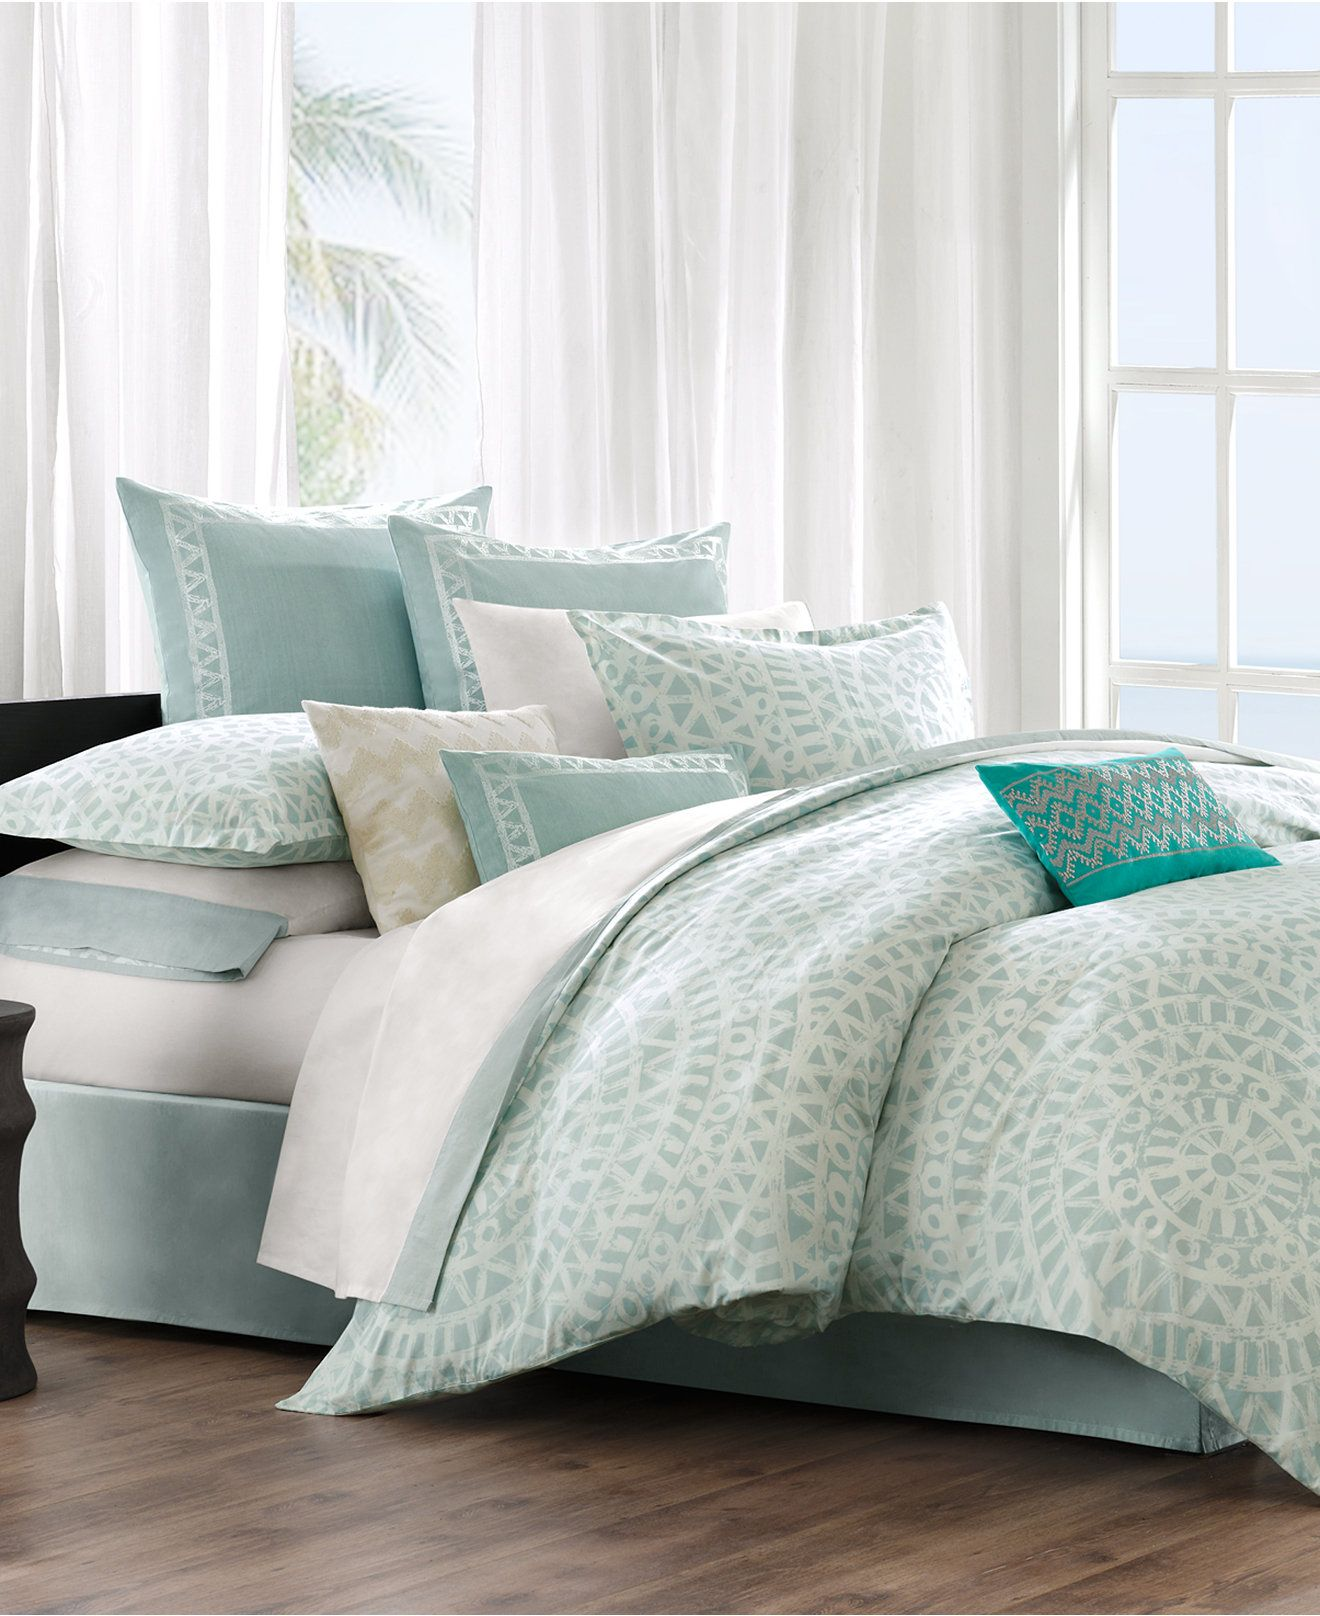 Echo Mykonos Bedding Collection Cotton